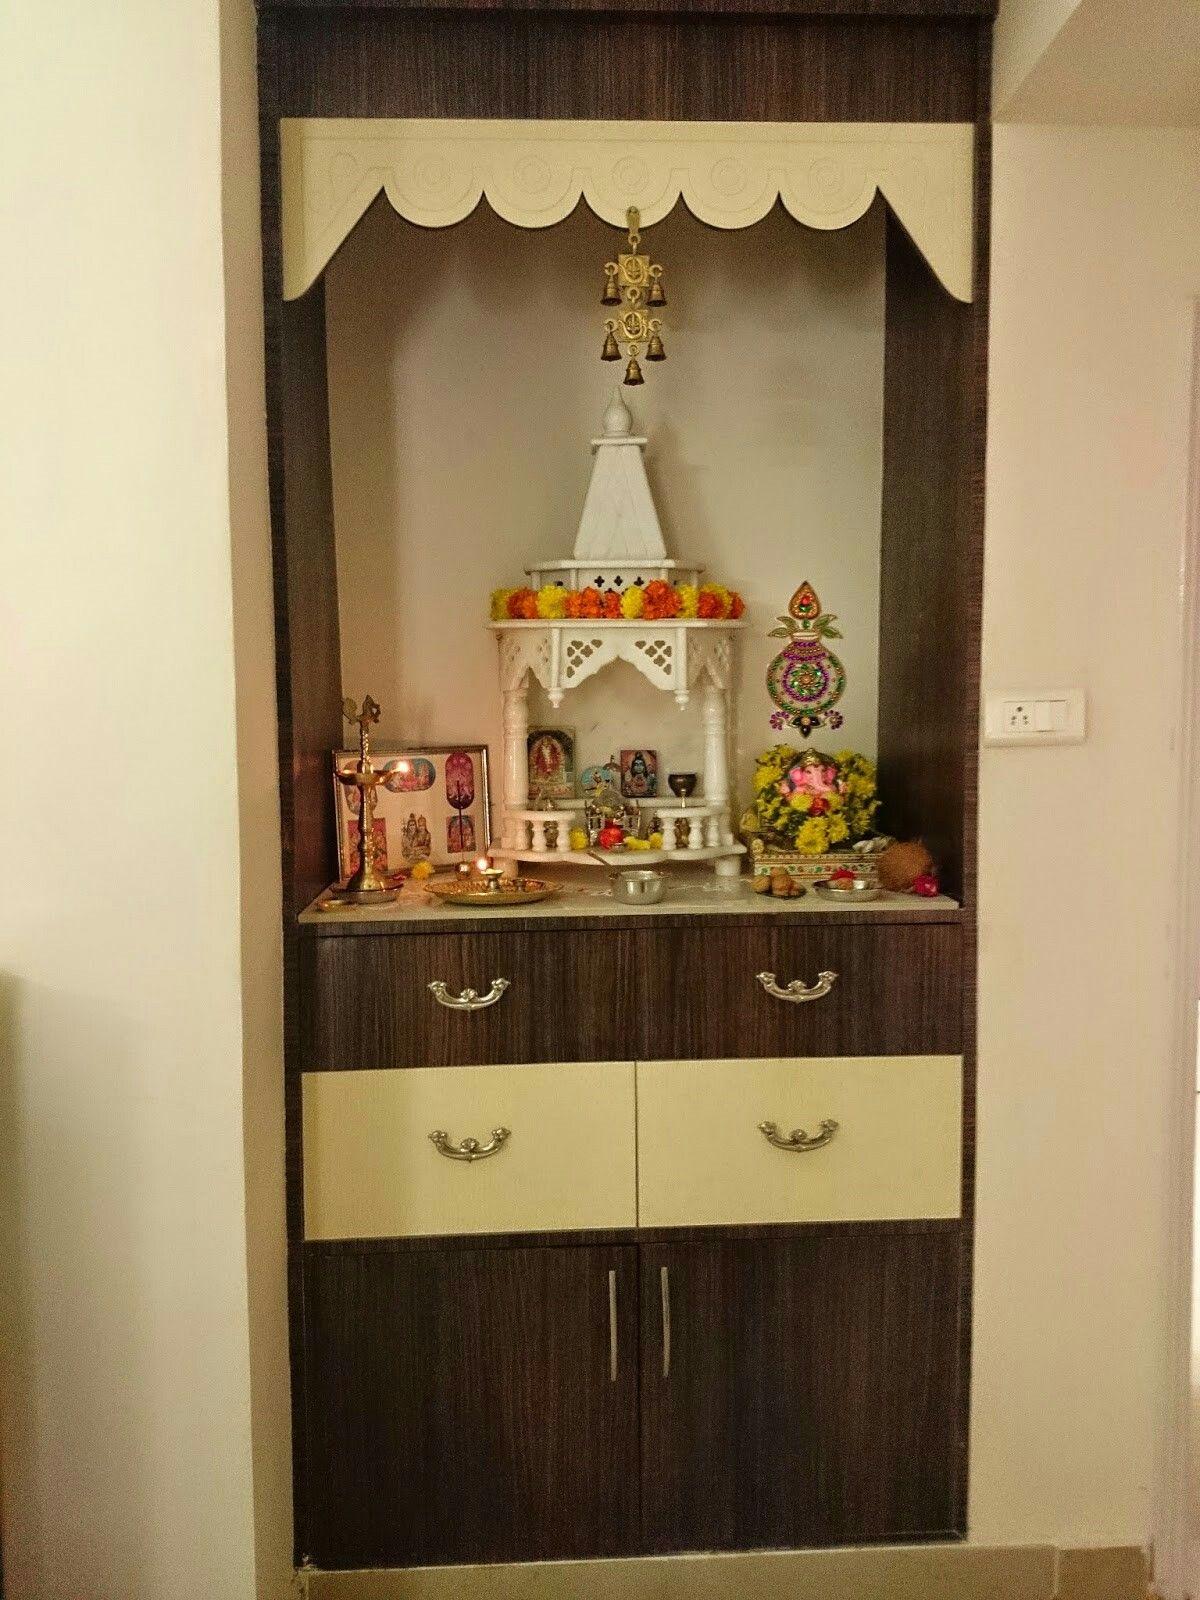 Best Kitchen Gallery: Small Pooja Room Puja Pinterest Room Puja Room And Interior of Pooja Room Furniture on rachelxblog.com